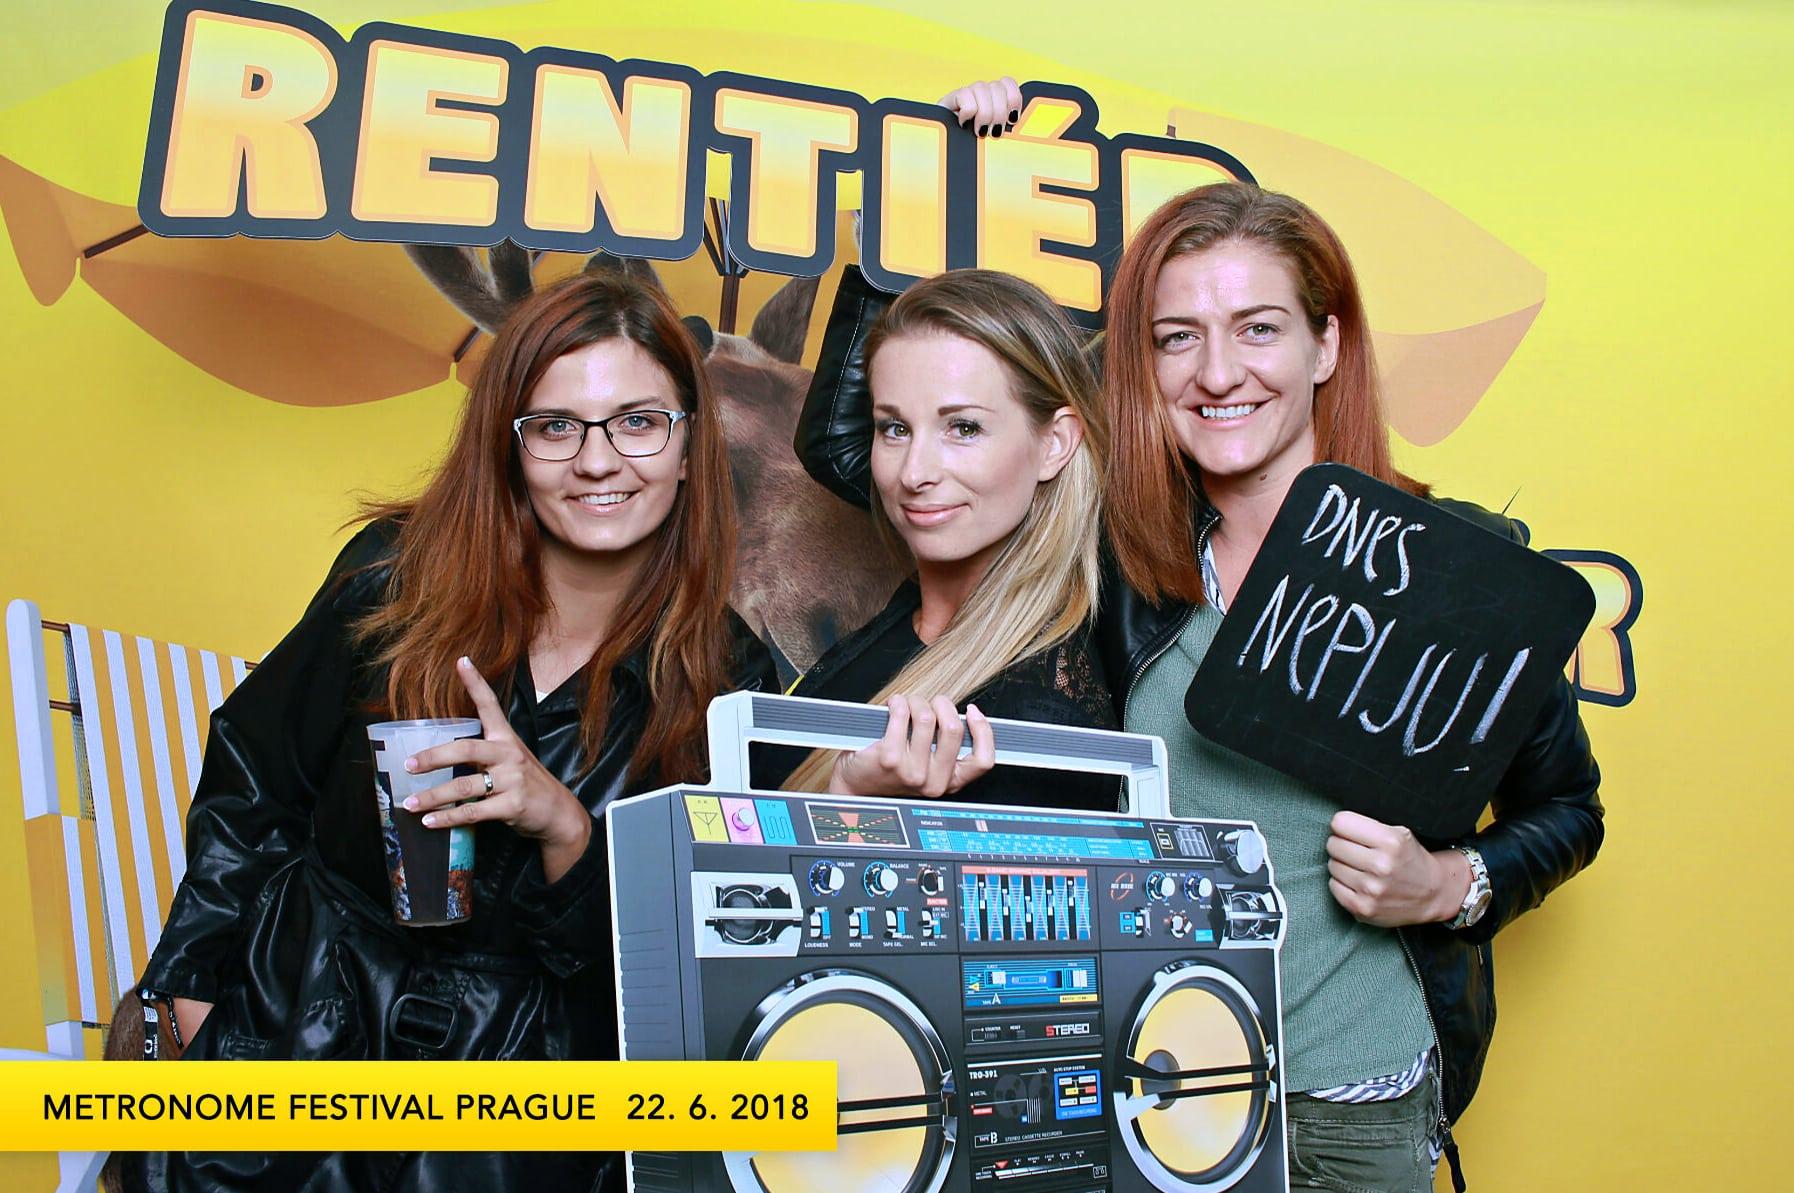 fotokoutek-rentier-metronome-festival-22-6-2018-445600